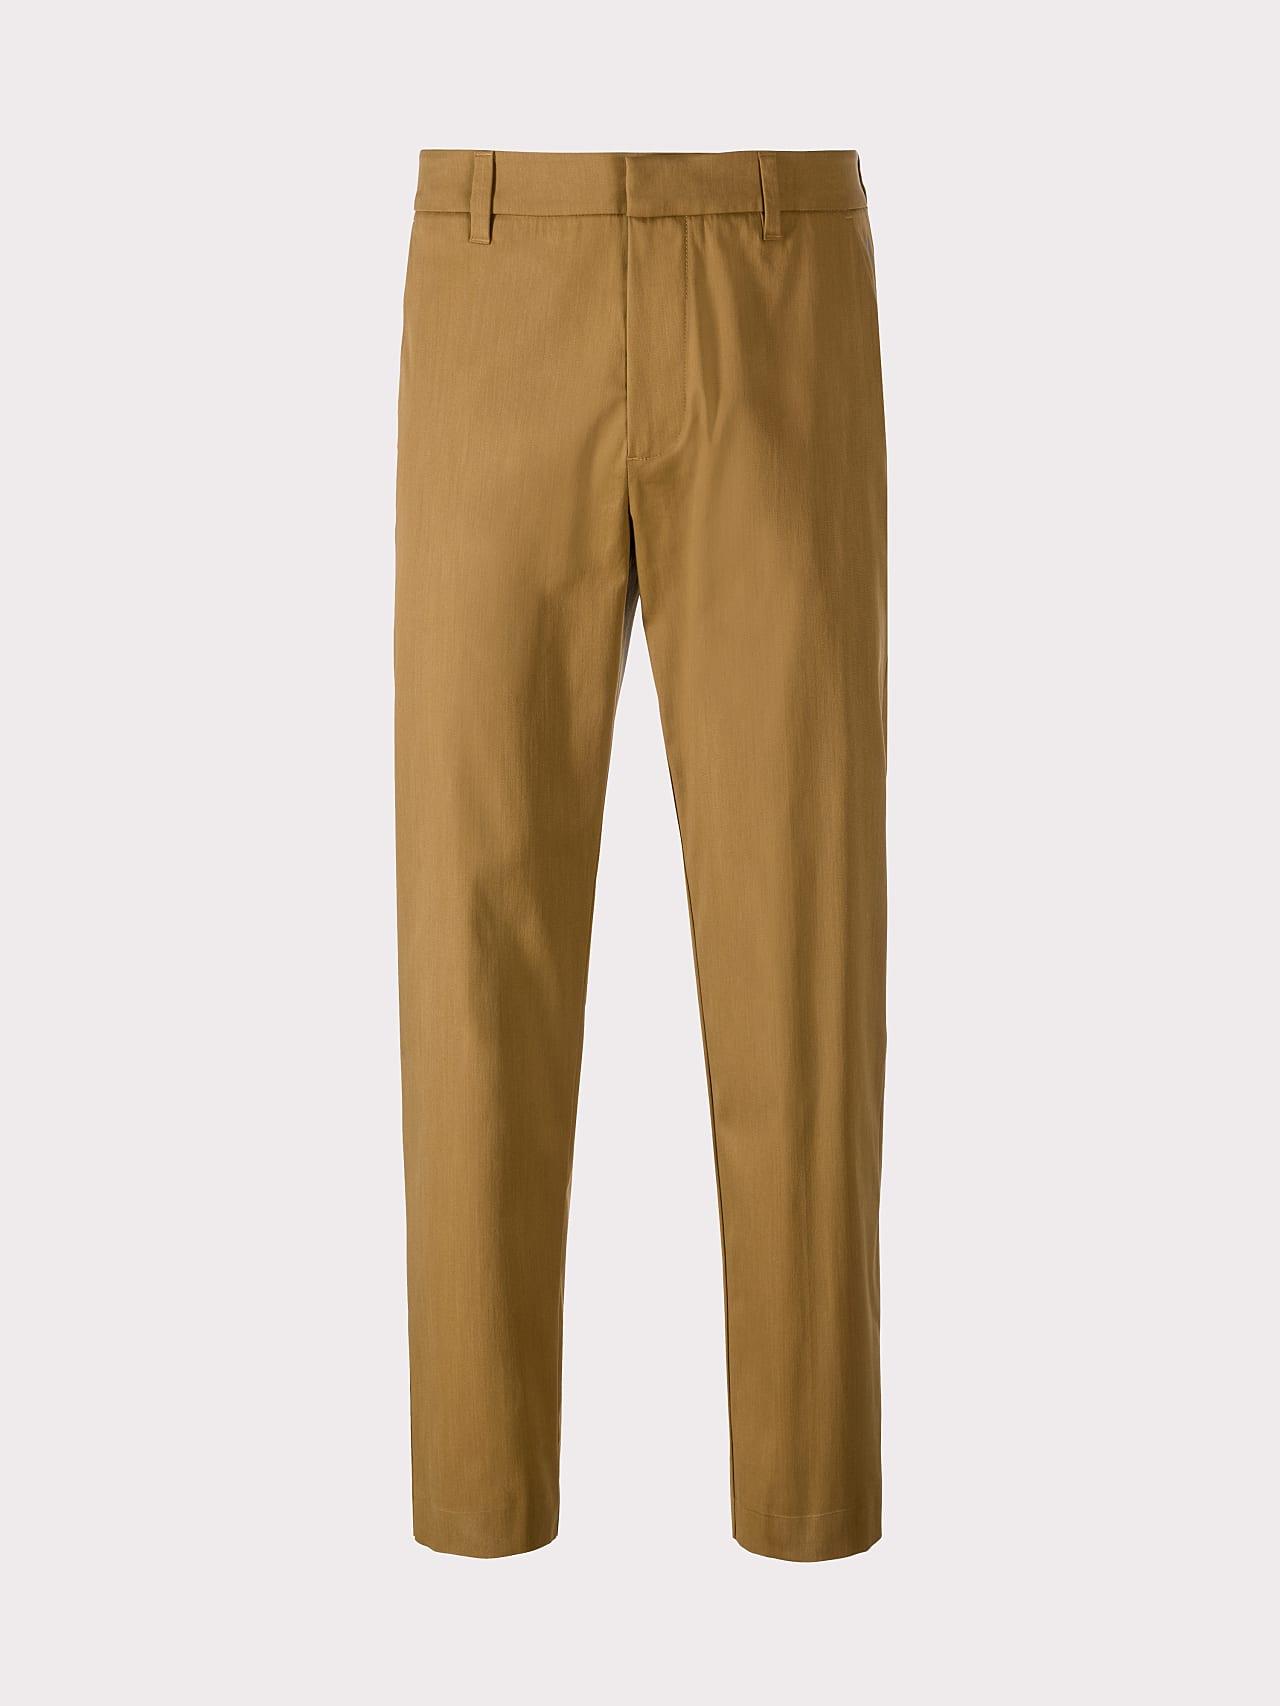 PLAIZ V2.Y5.01 Water-Repellent Cotton-Stretch Chino brown Back Alpha Tauri